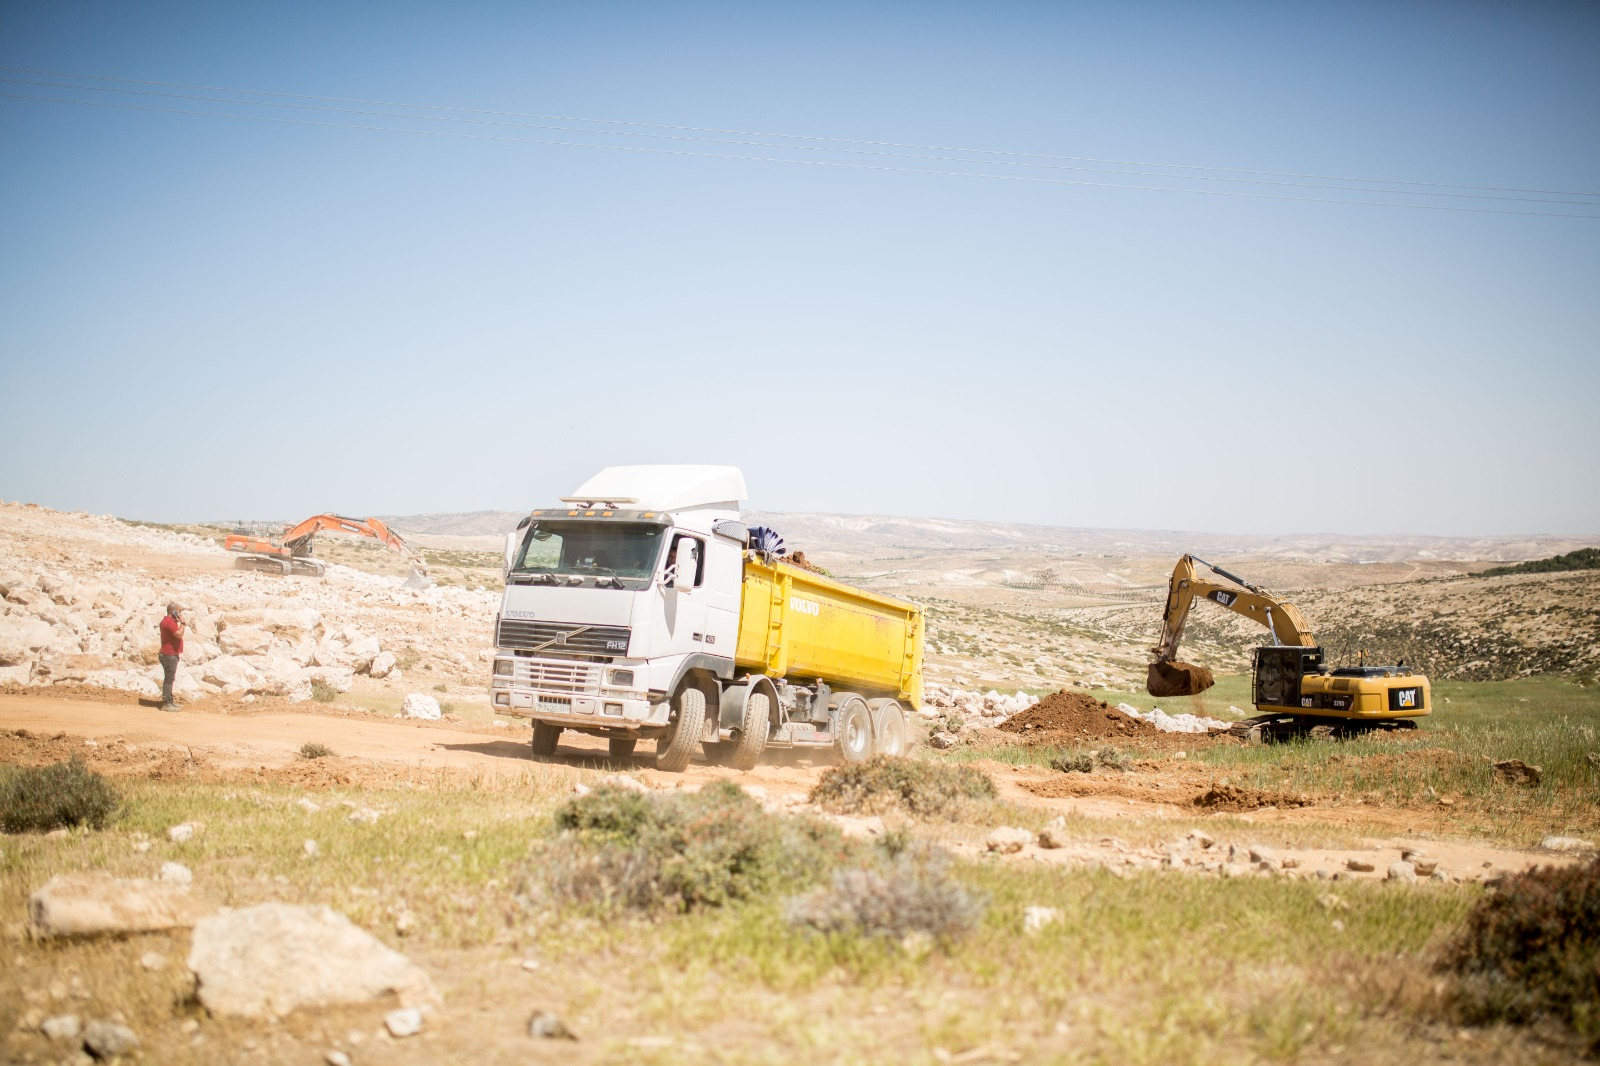 Israeli bulldozers trucking fertile soil from the wadi uphill to the development site in Ein al-Beida, West Bank, April 15, 2021. (Emily Glick)